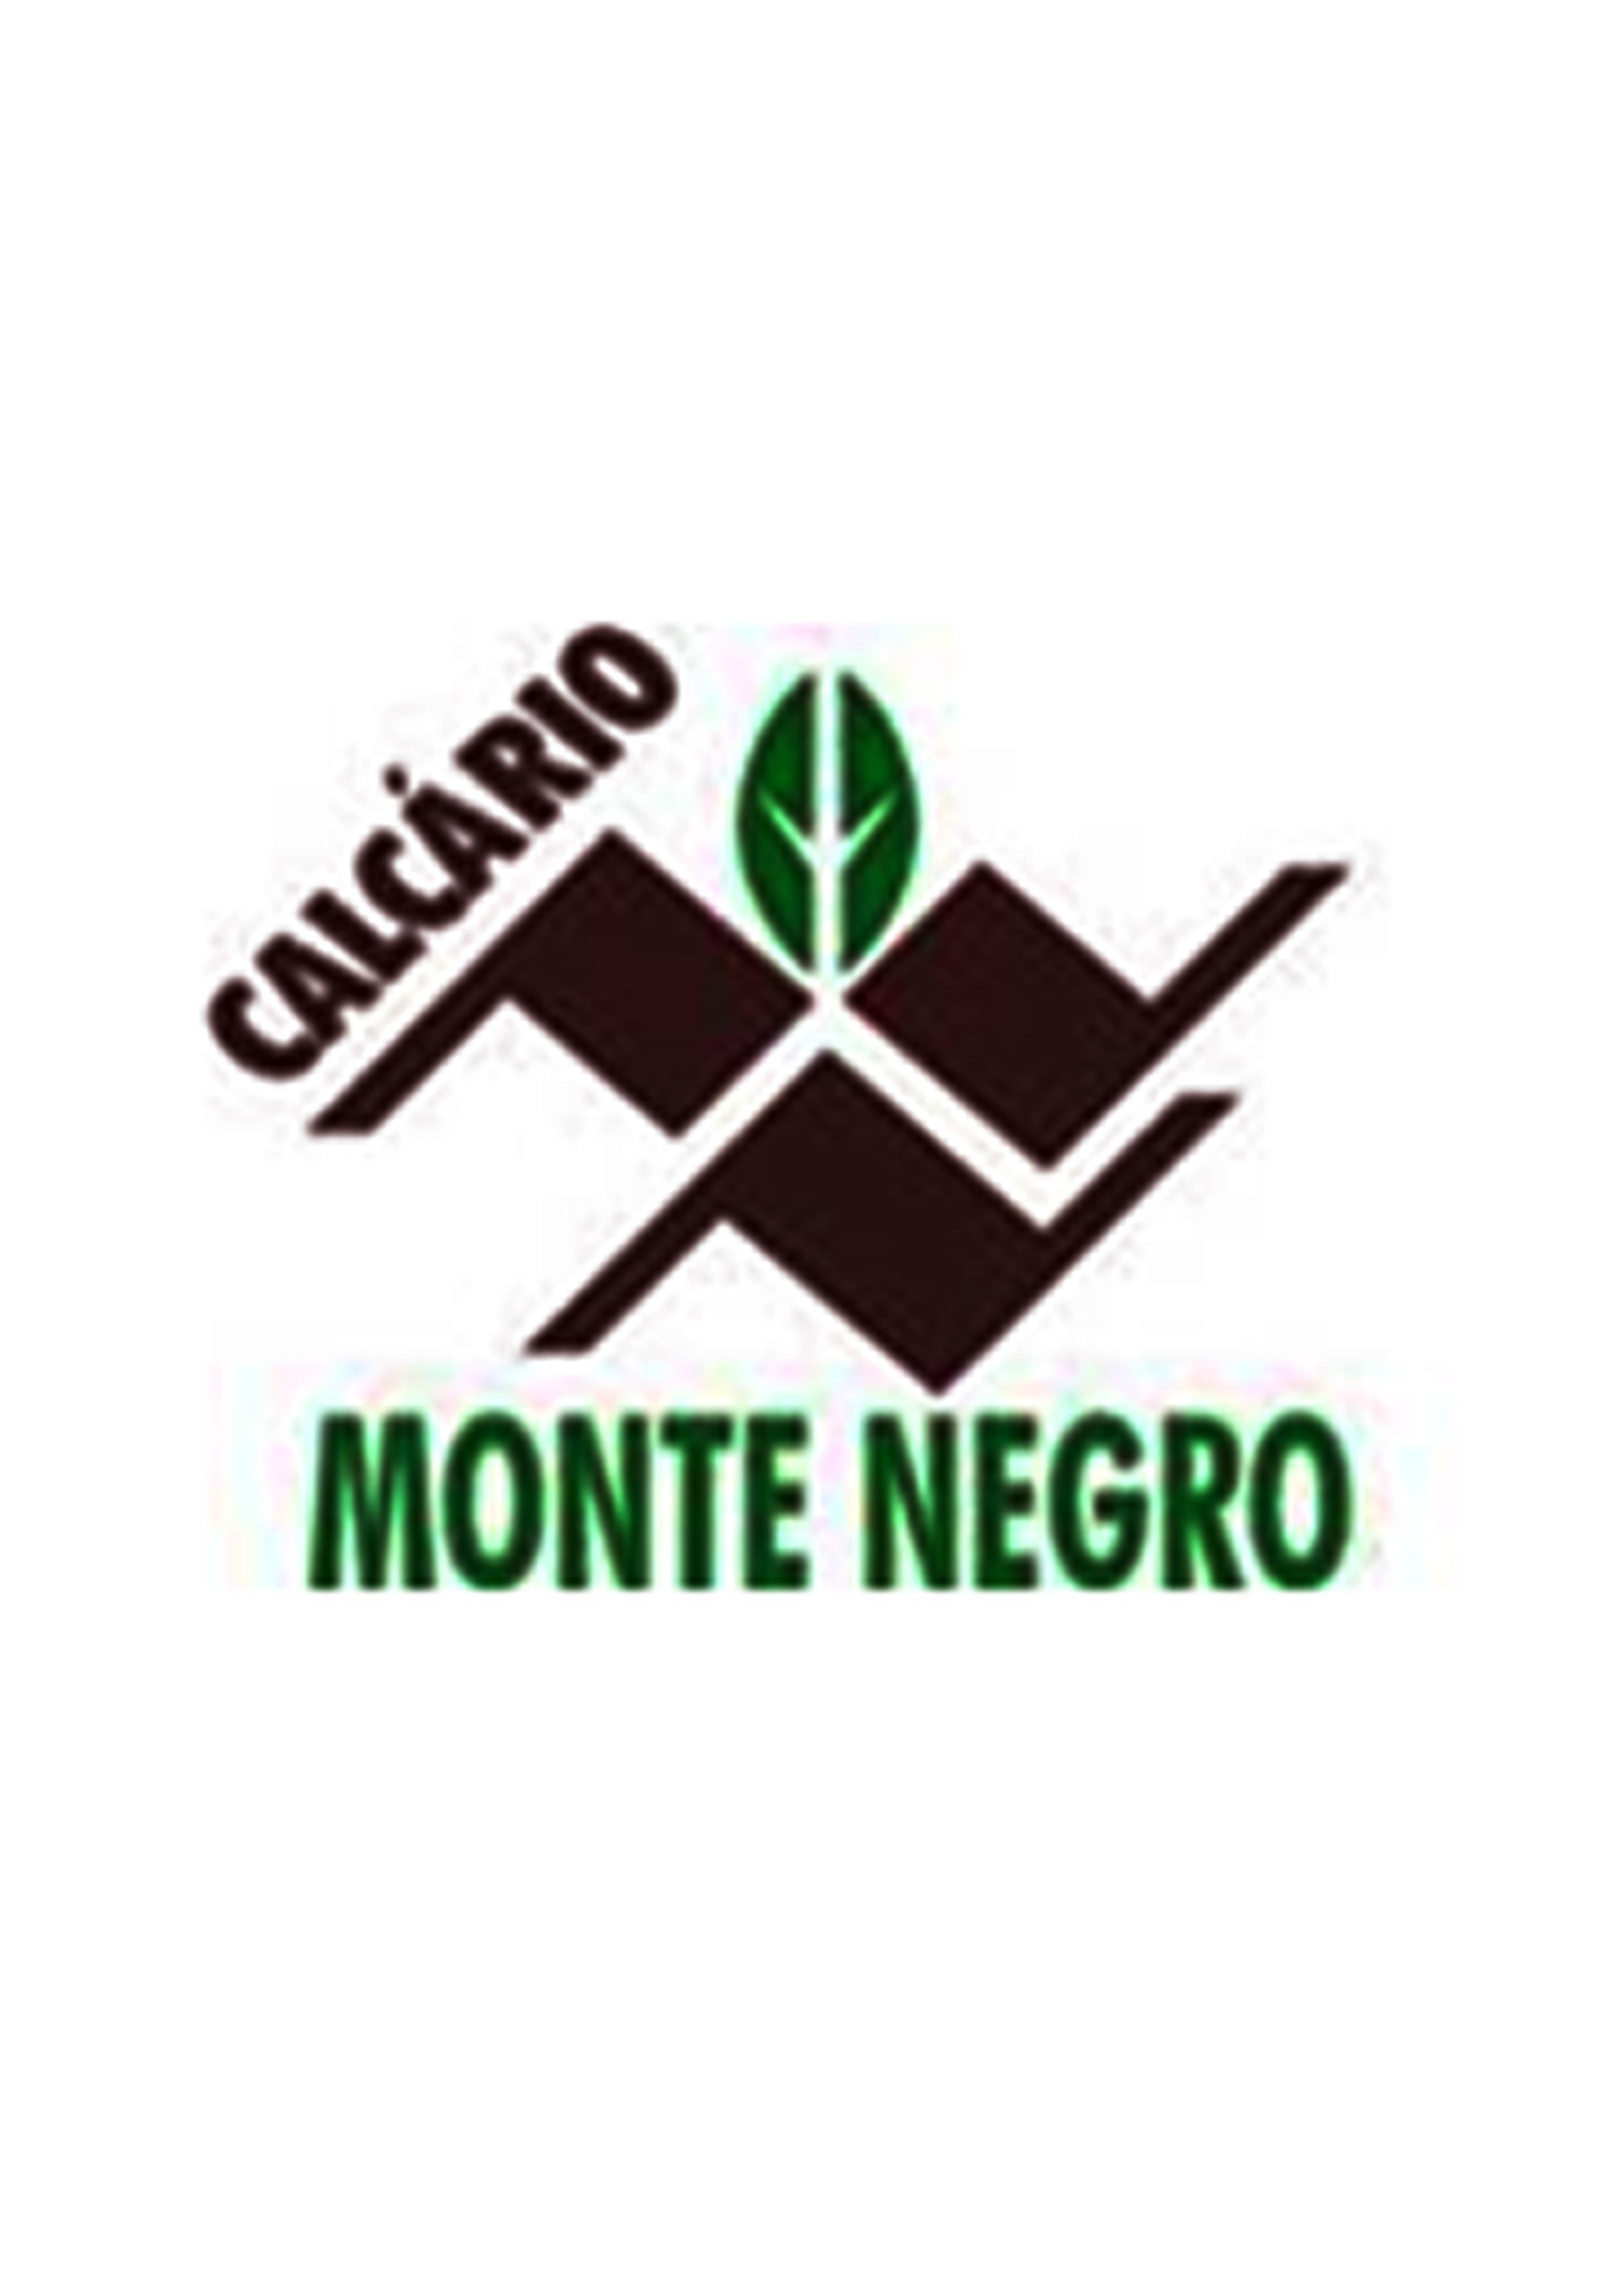 logo Monte negro